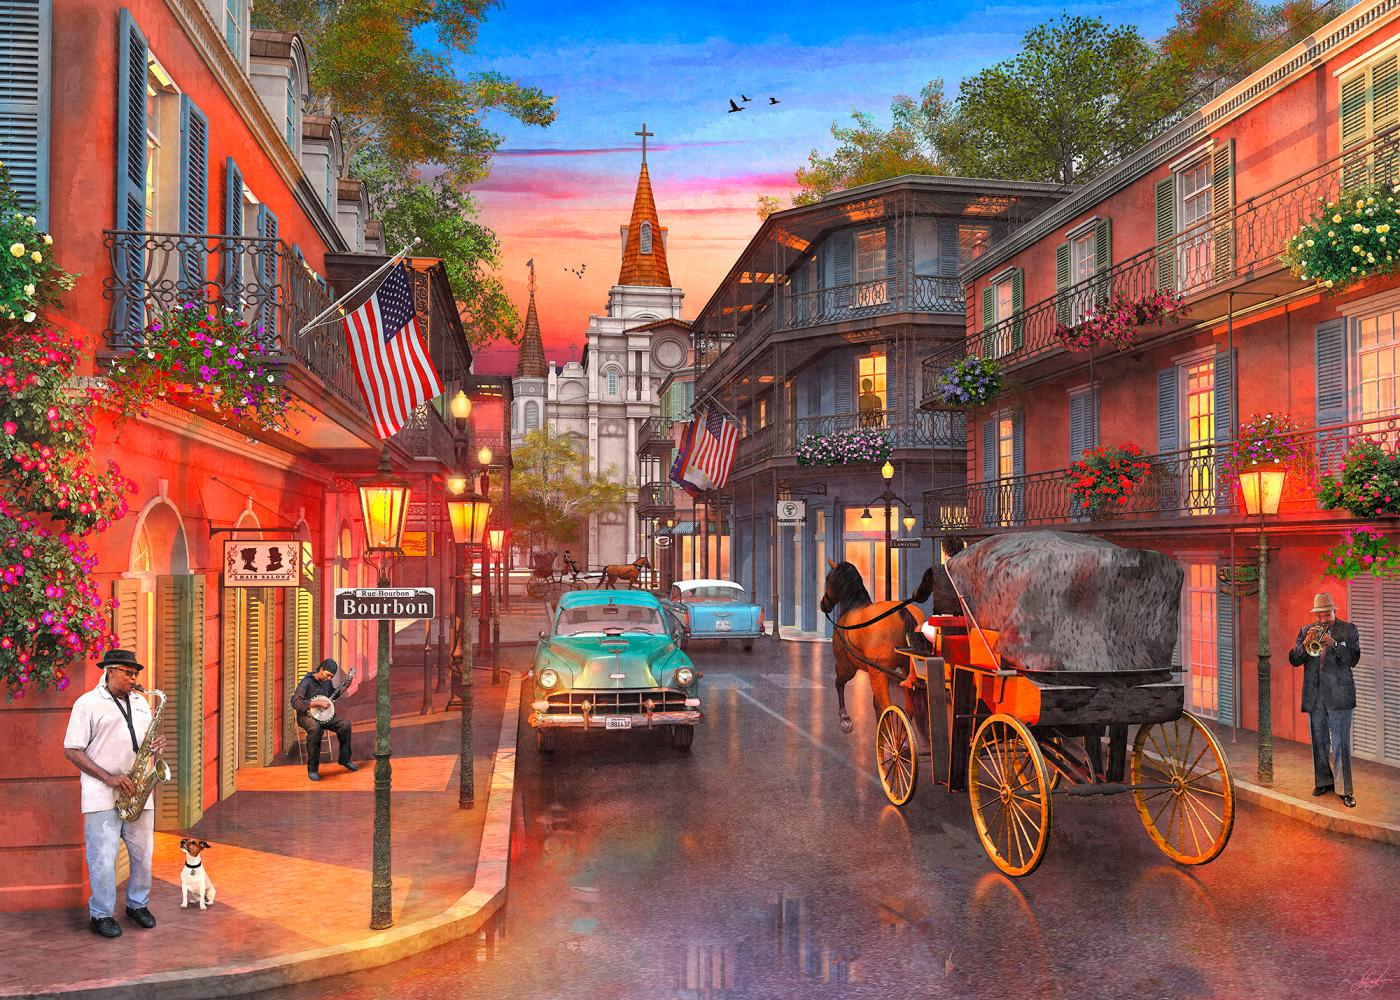 Bourbon Street Travel Jigsaw Puzzle